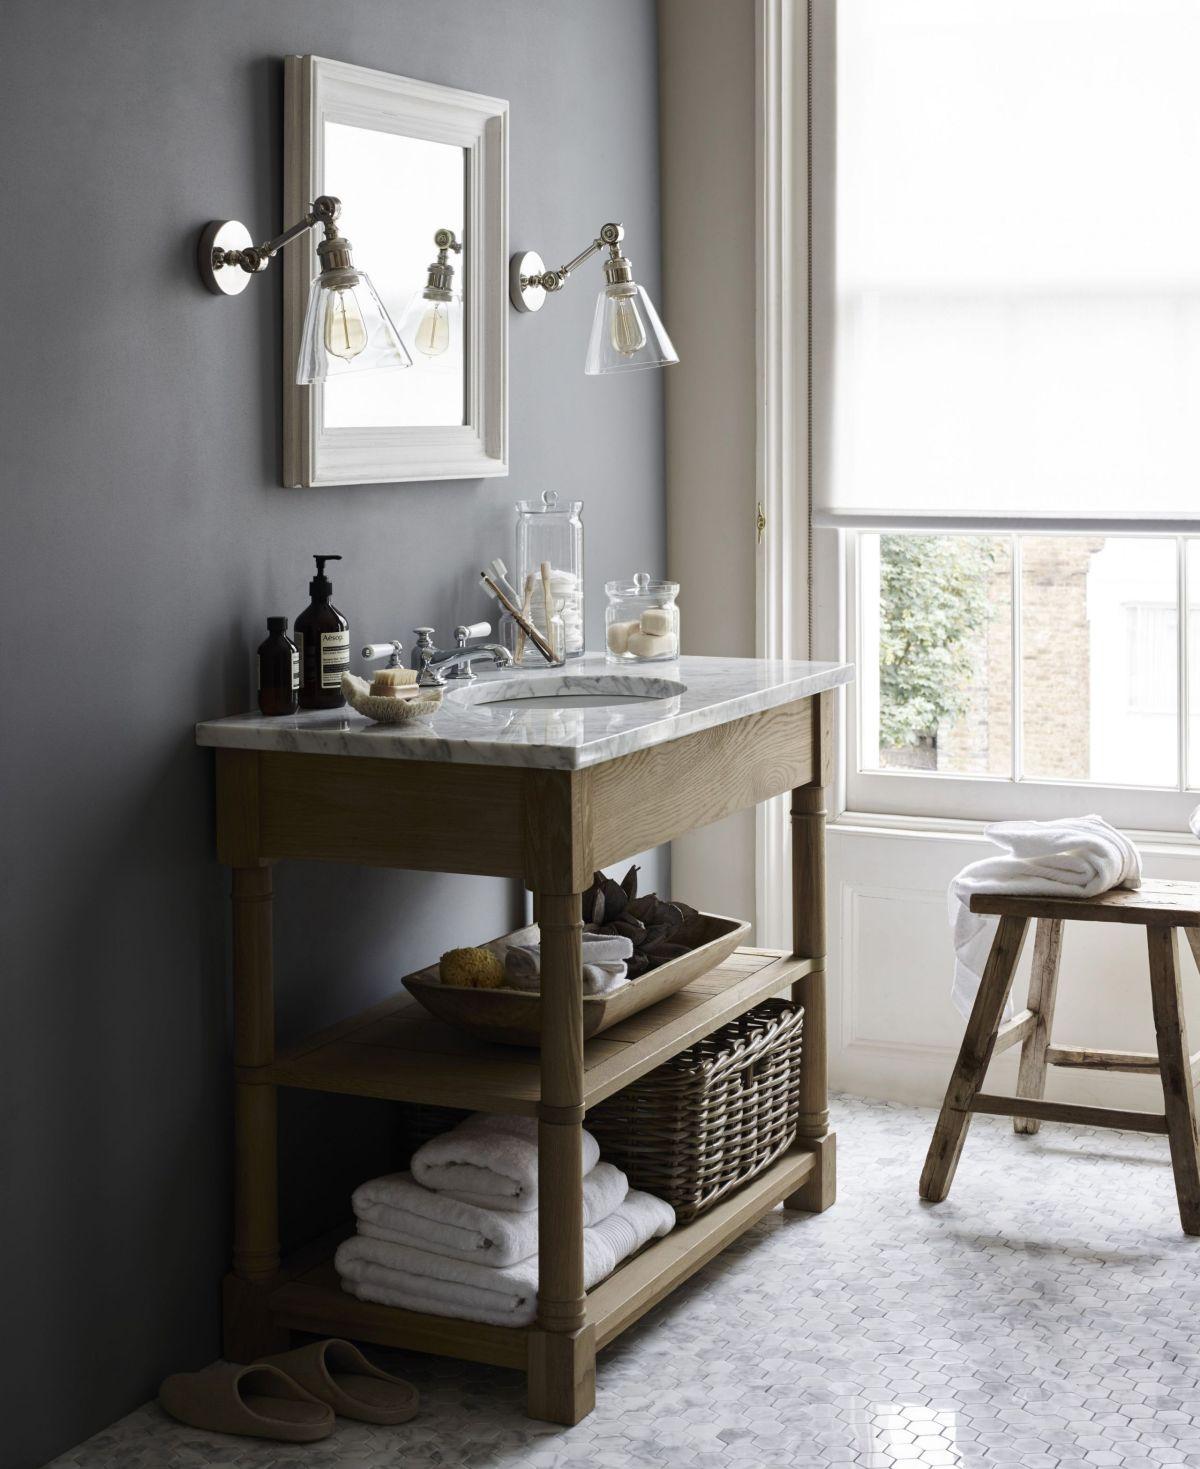 How to choose bathroom lighting | Real Homes